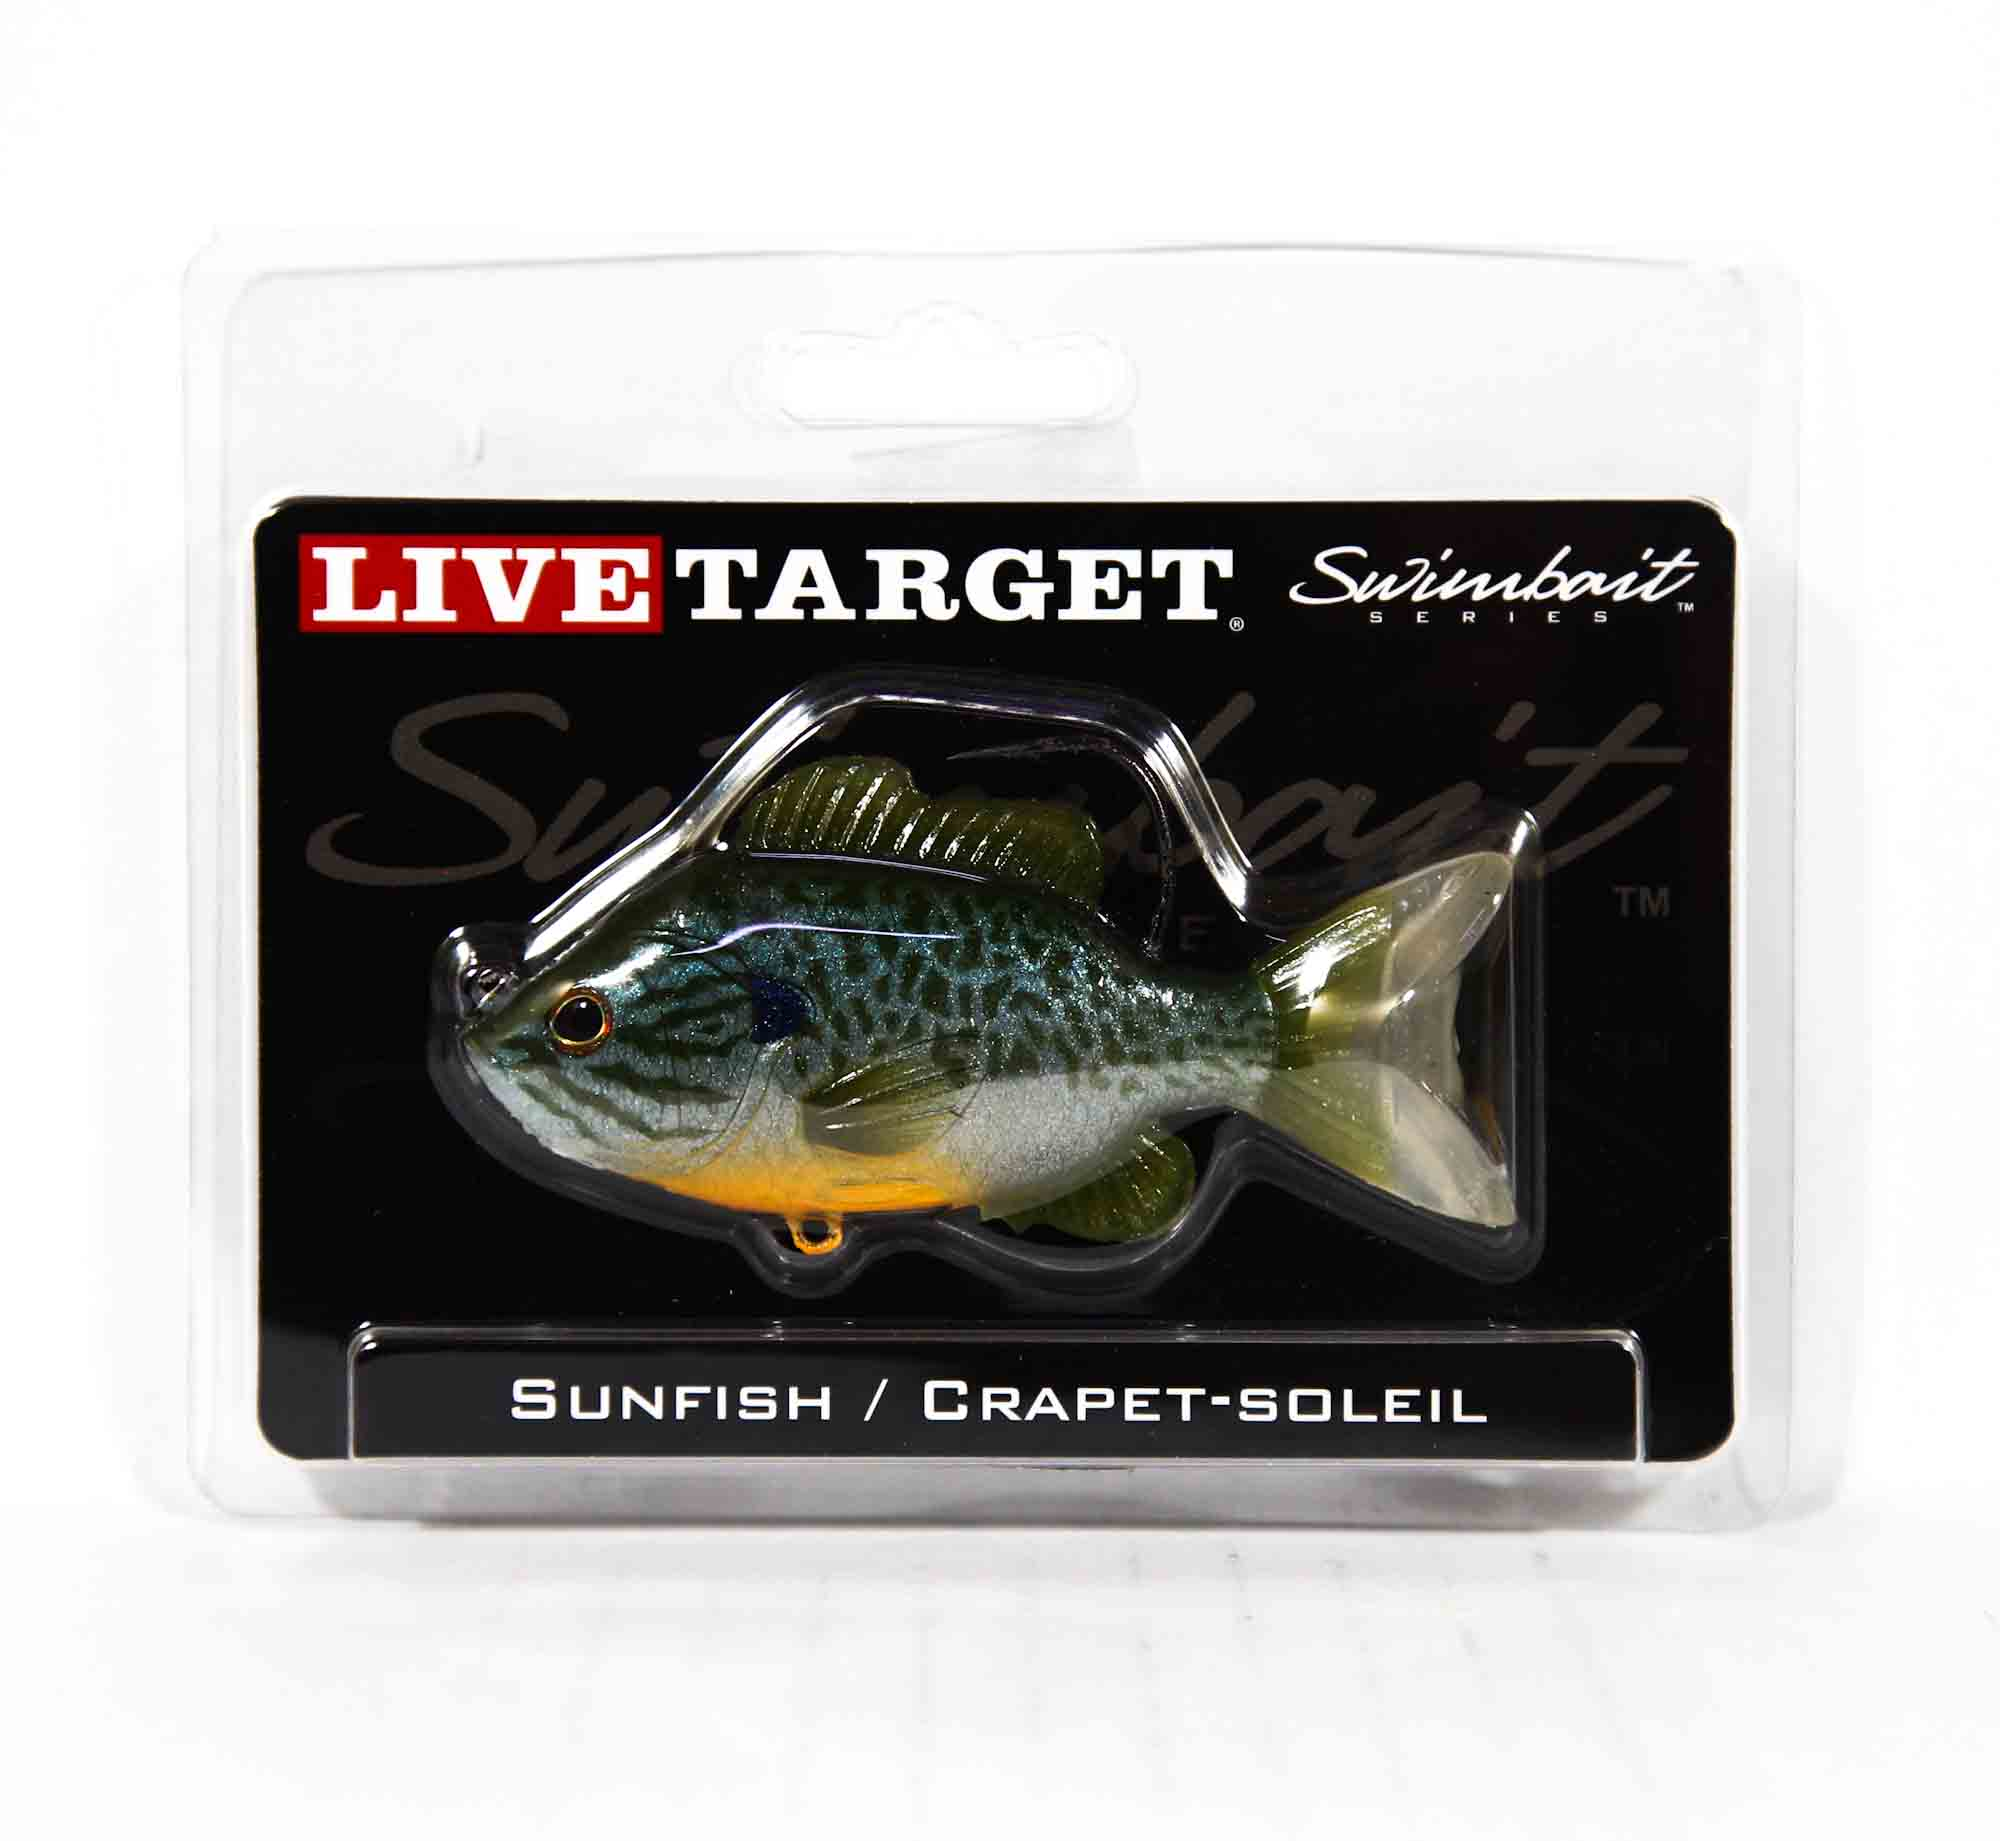 Live Target SFS90MS551 Swimbait Sunfish 3.5 Inch N Blue Pumpkinseed (0583)